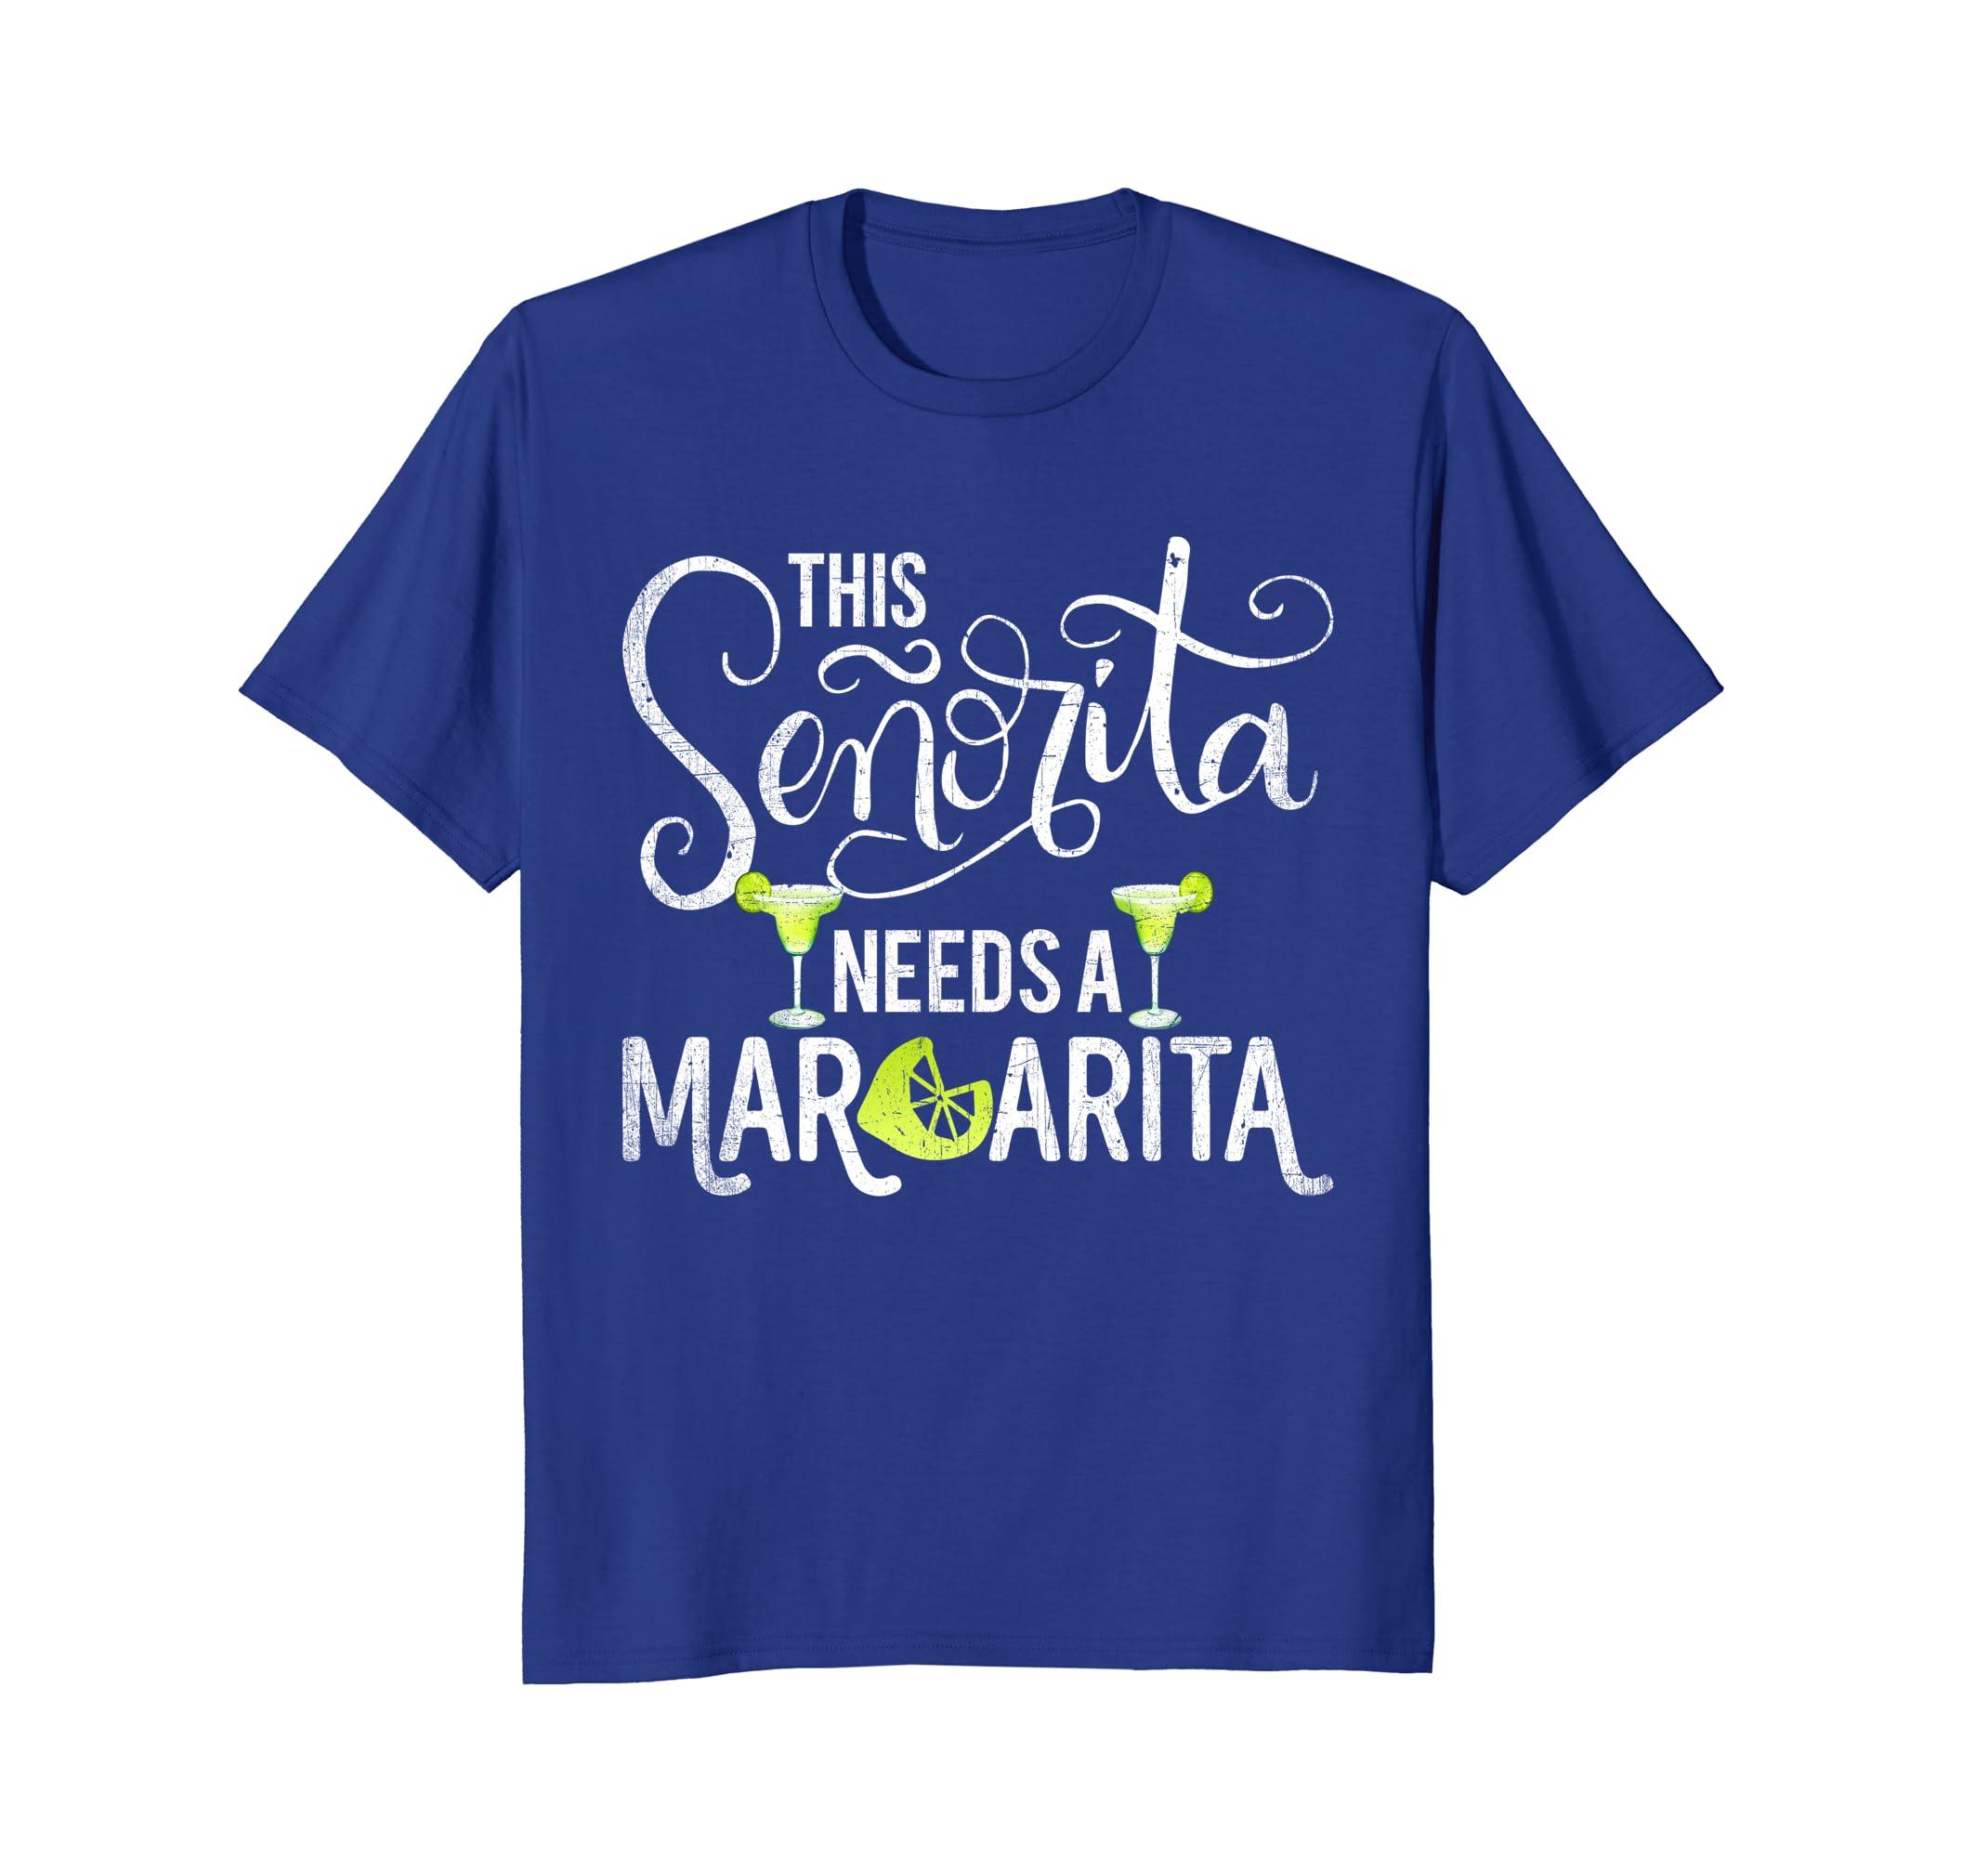 8f4eaf390f9 Amazon.com: This Senorita Needs A Margarita T-Shirt: Clothing